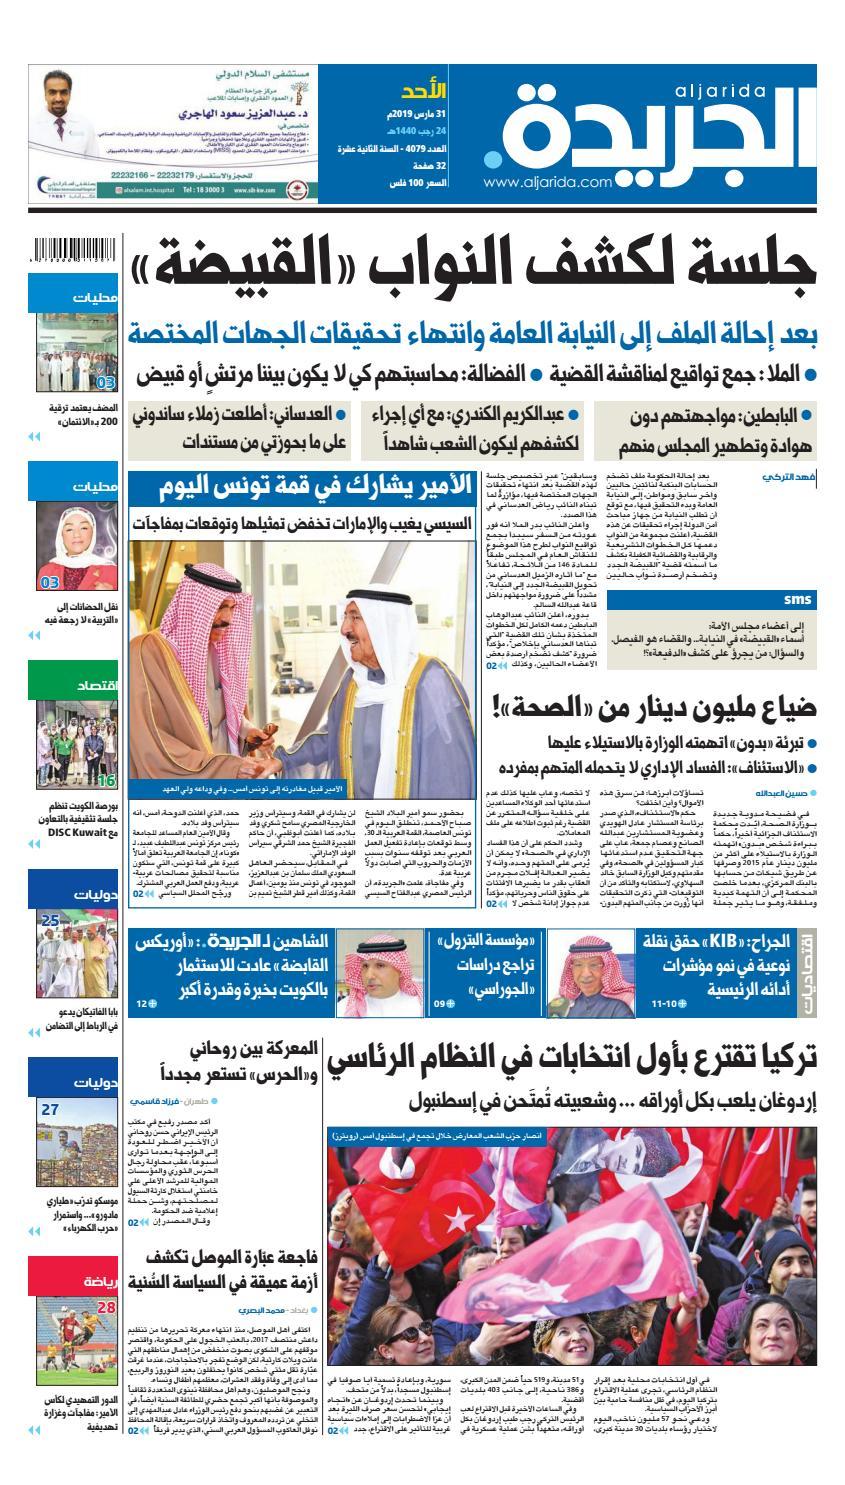 f4b879de7 عدد الجريدة الأحد 31 مارس 2019 by Aljarida Newspaper - issuu